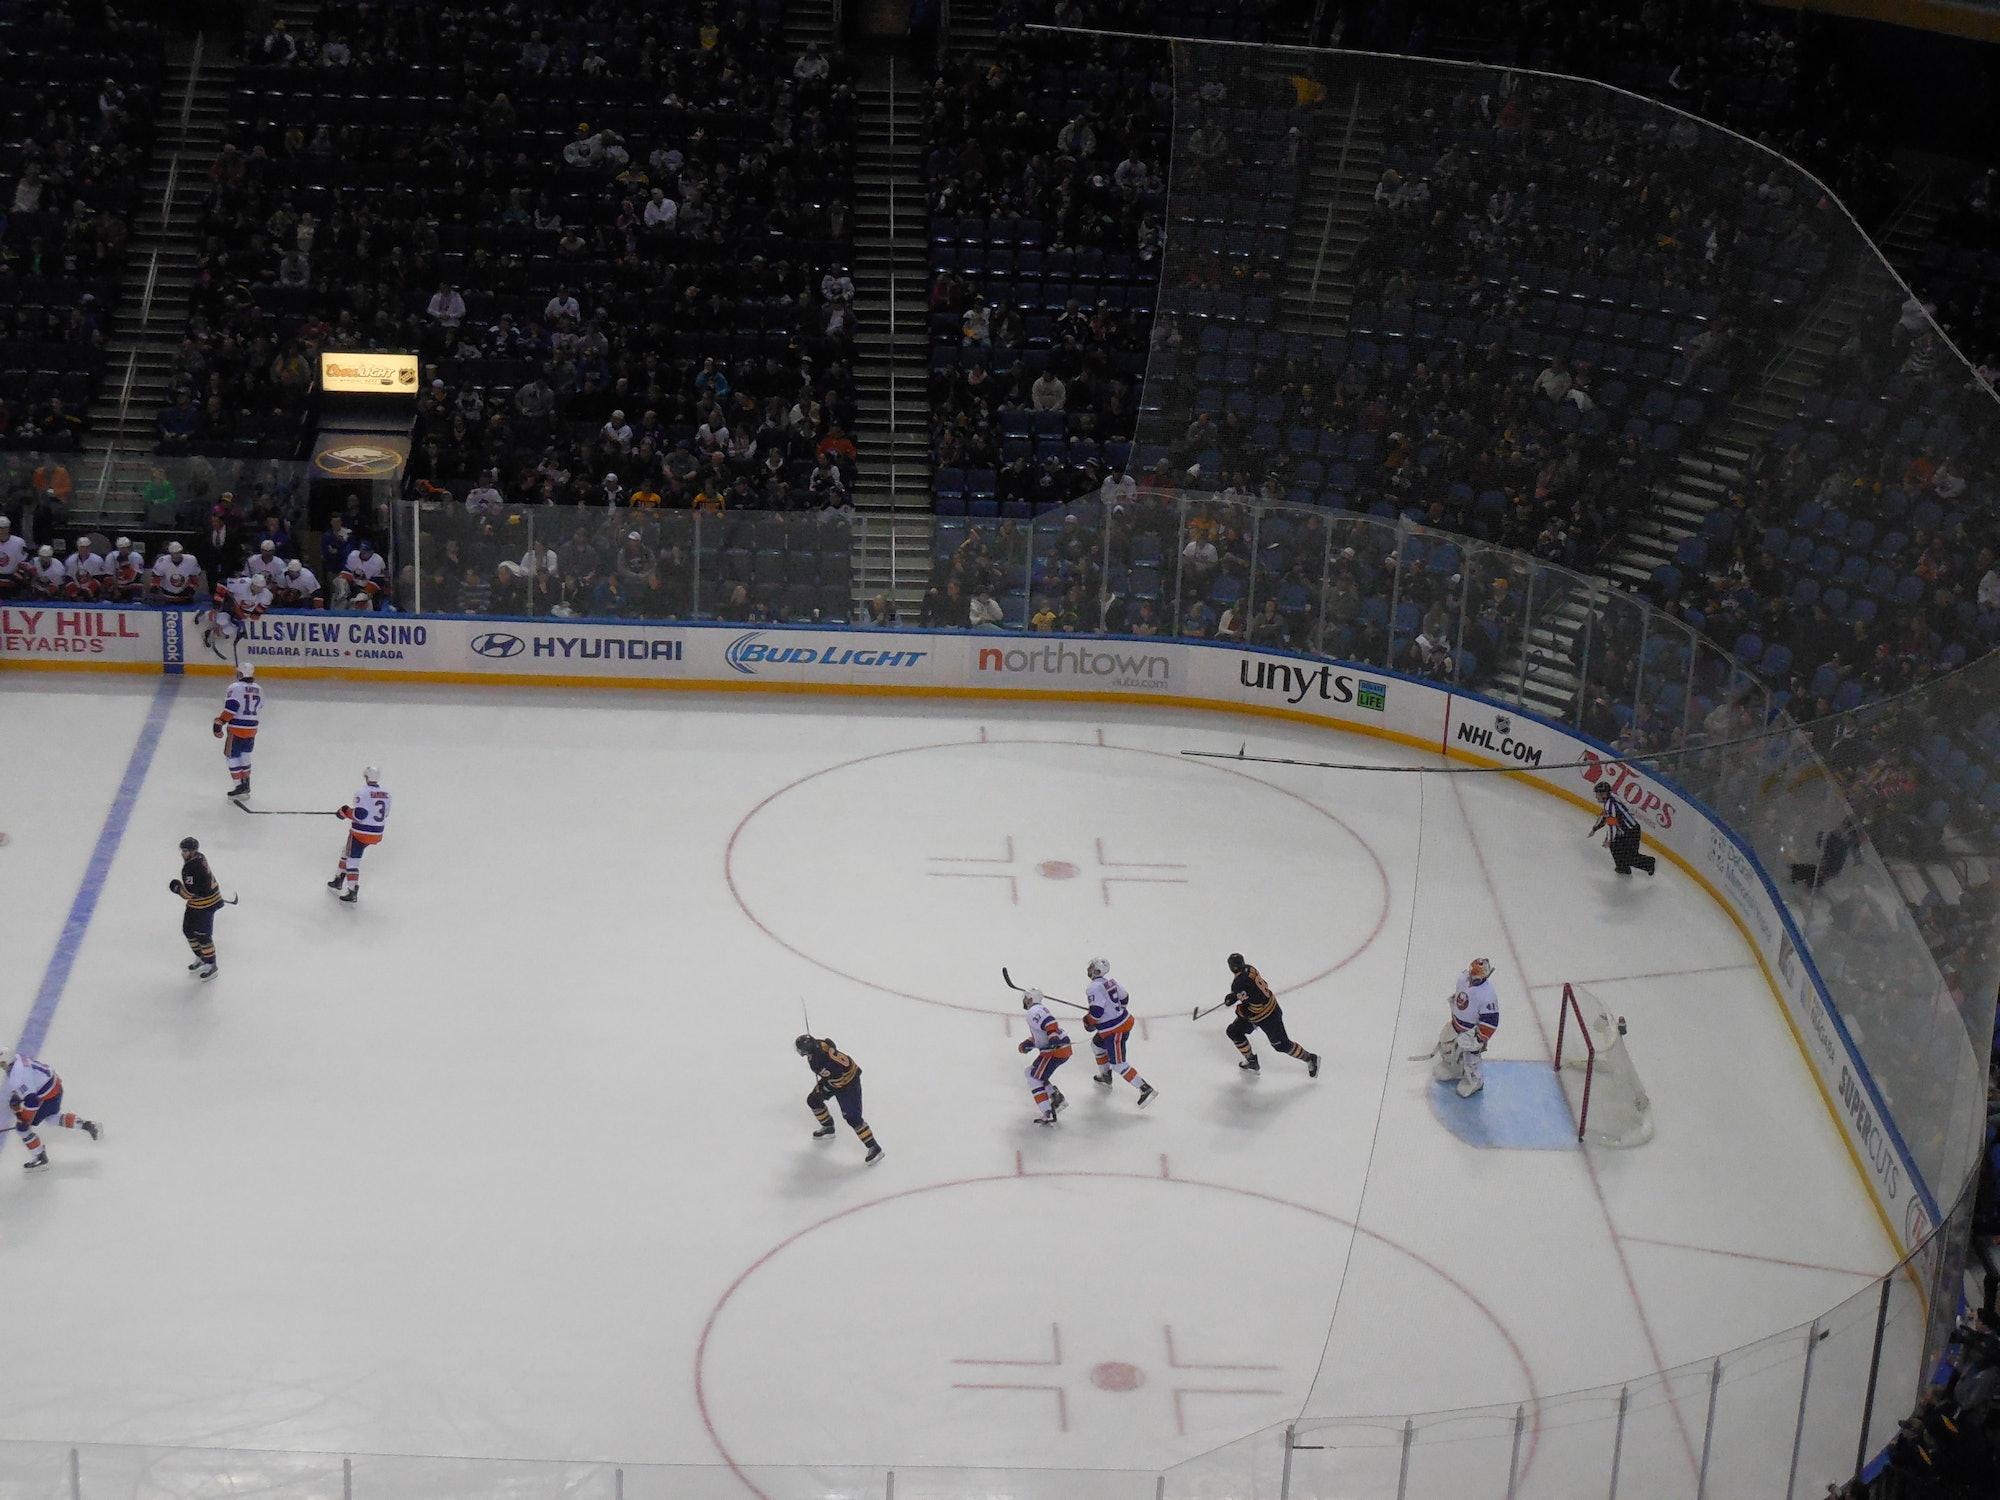 New York Islanders vs. Buffalo Sabres - February 8, 2015